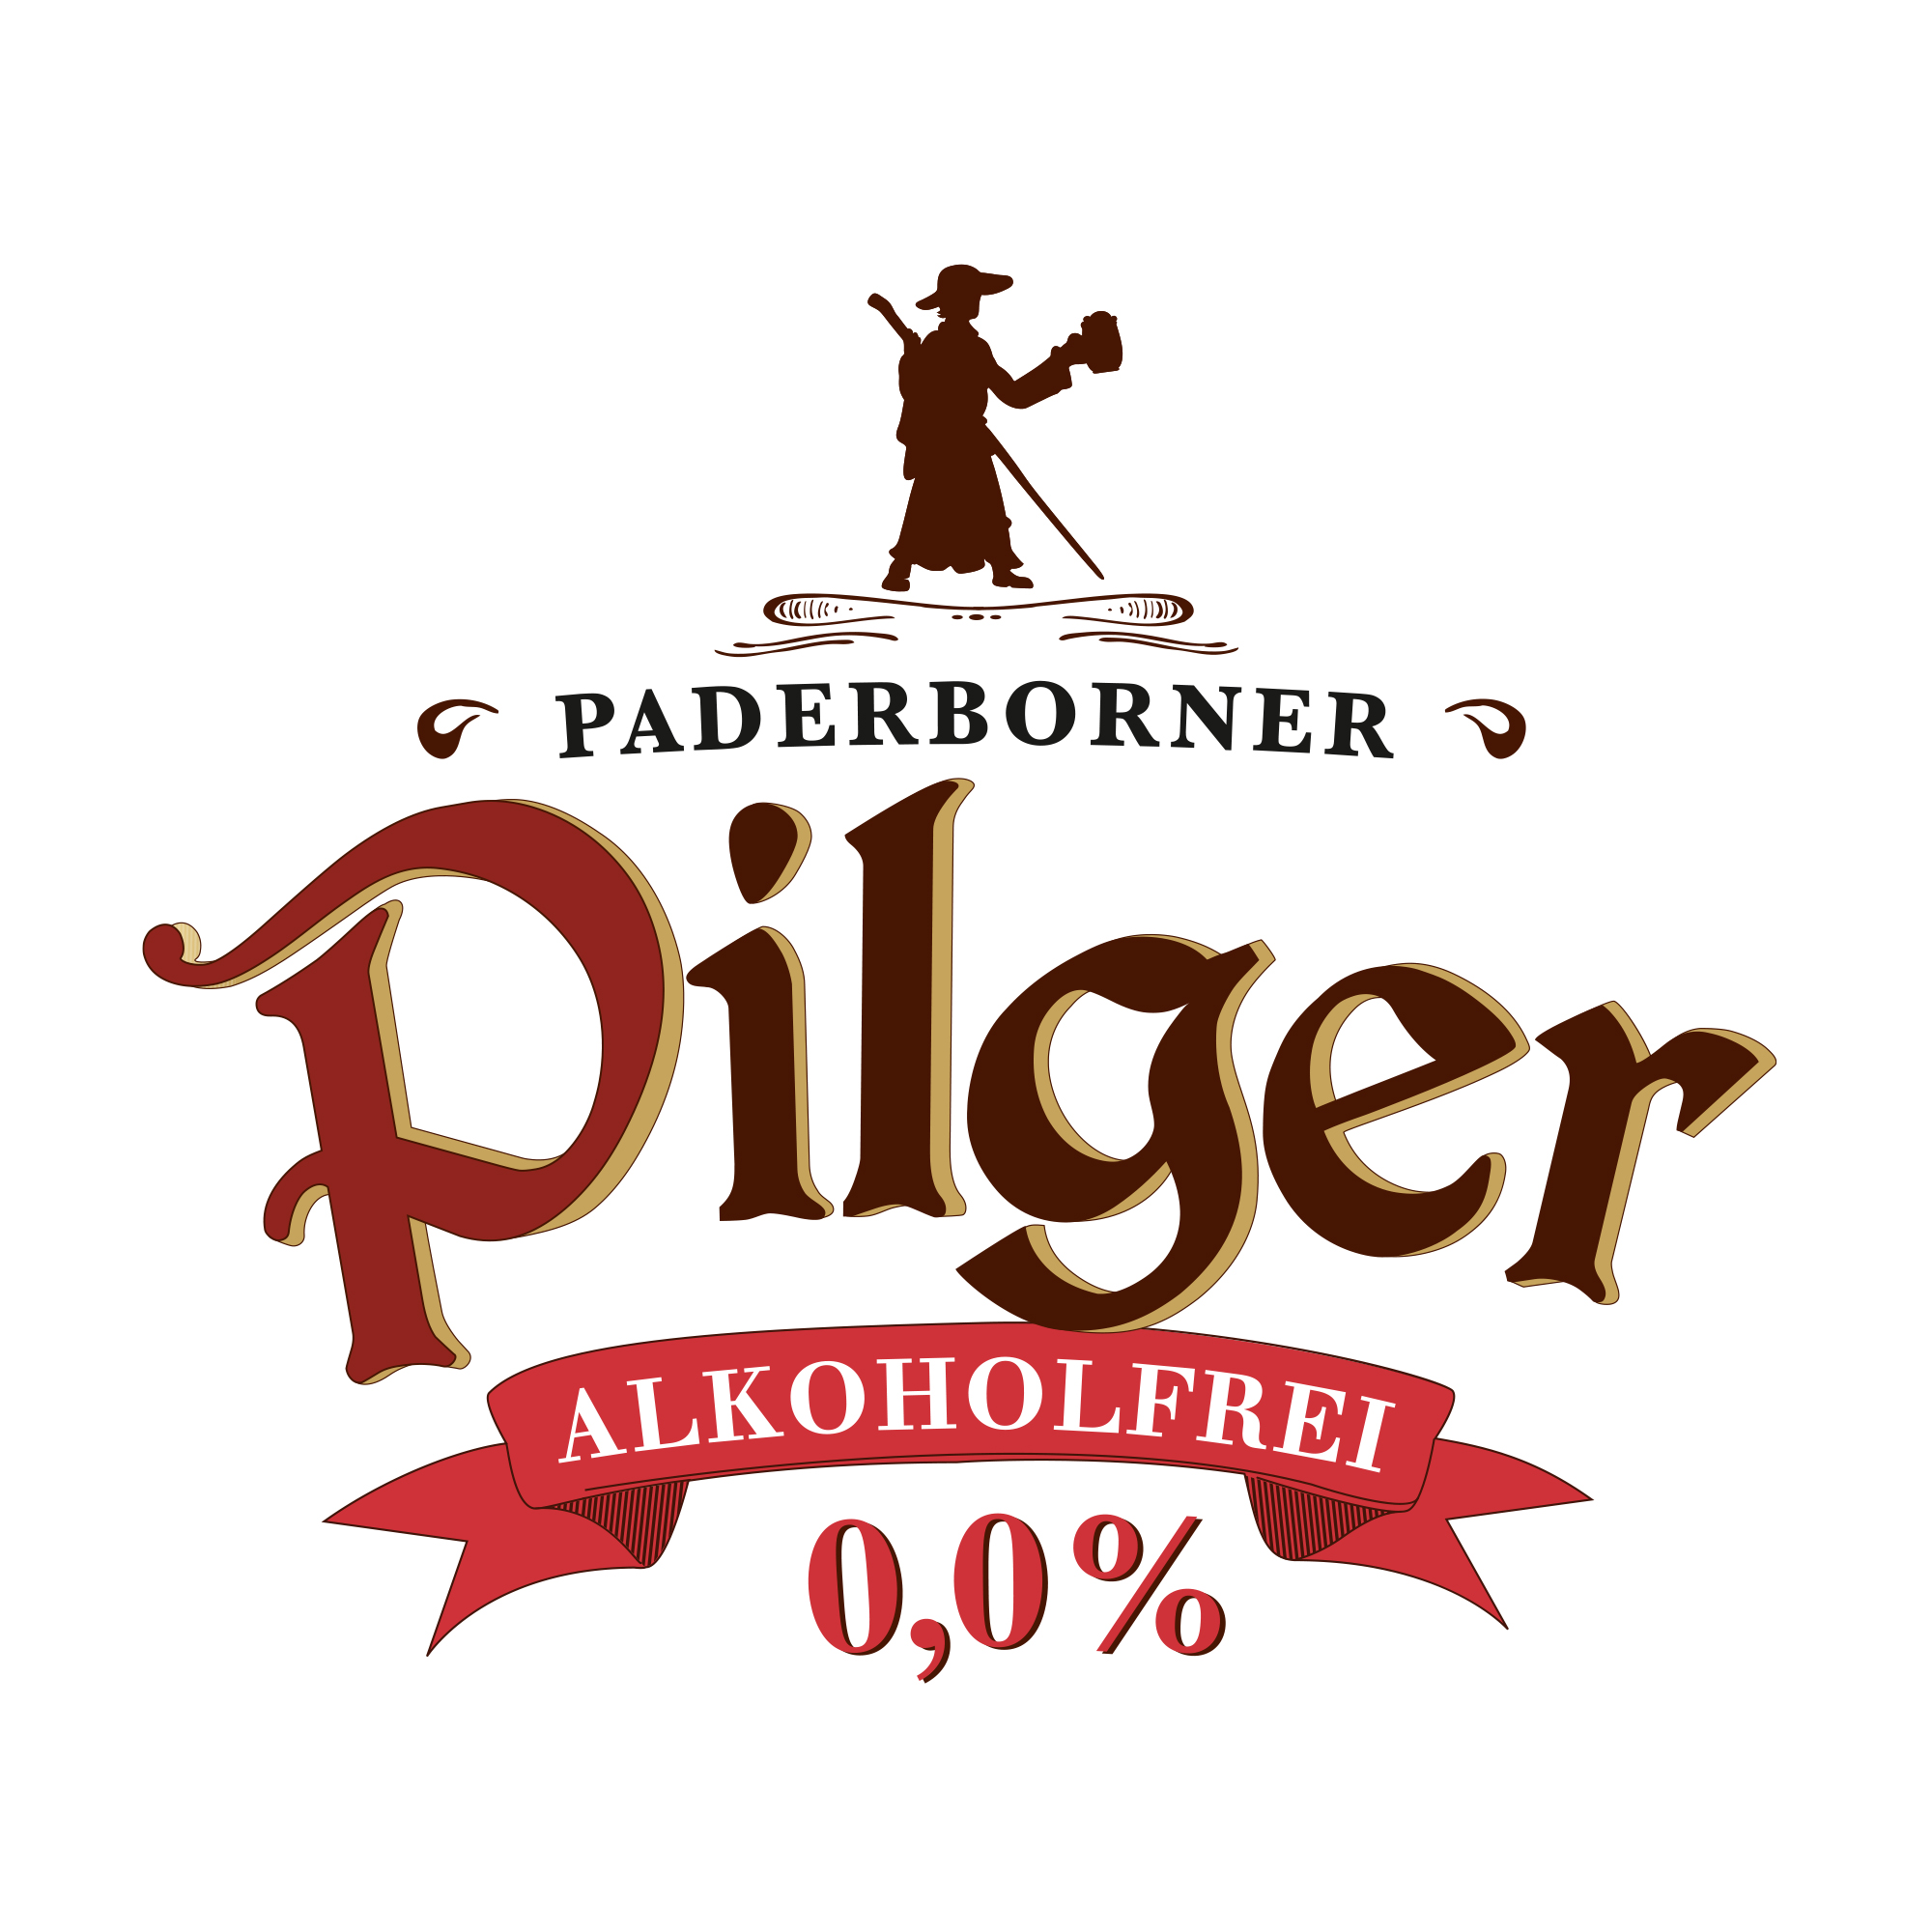 Logo Paderborner Pilger Alkoholfrei